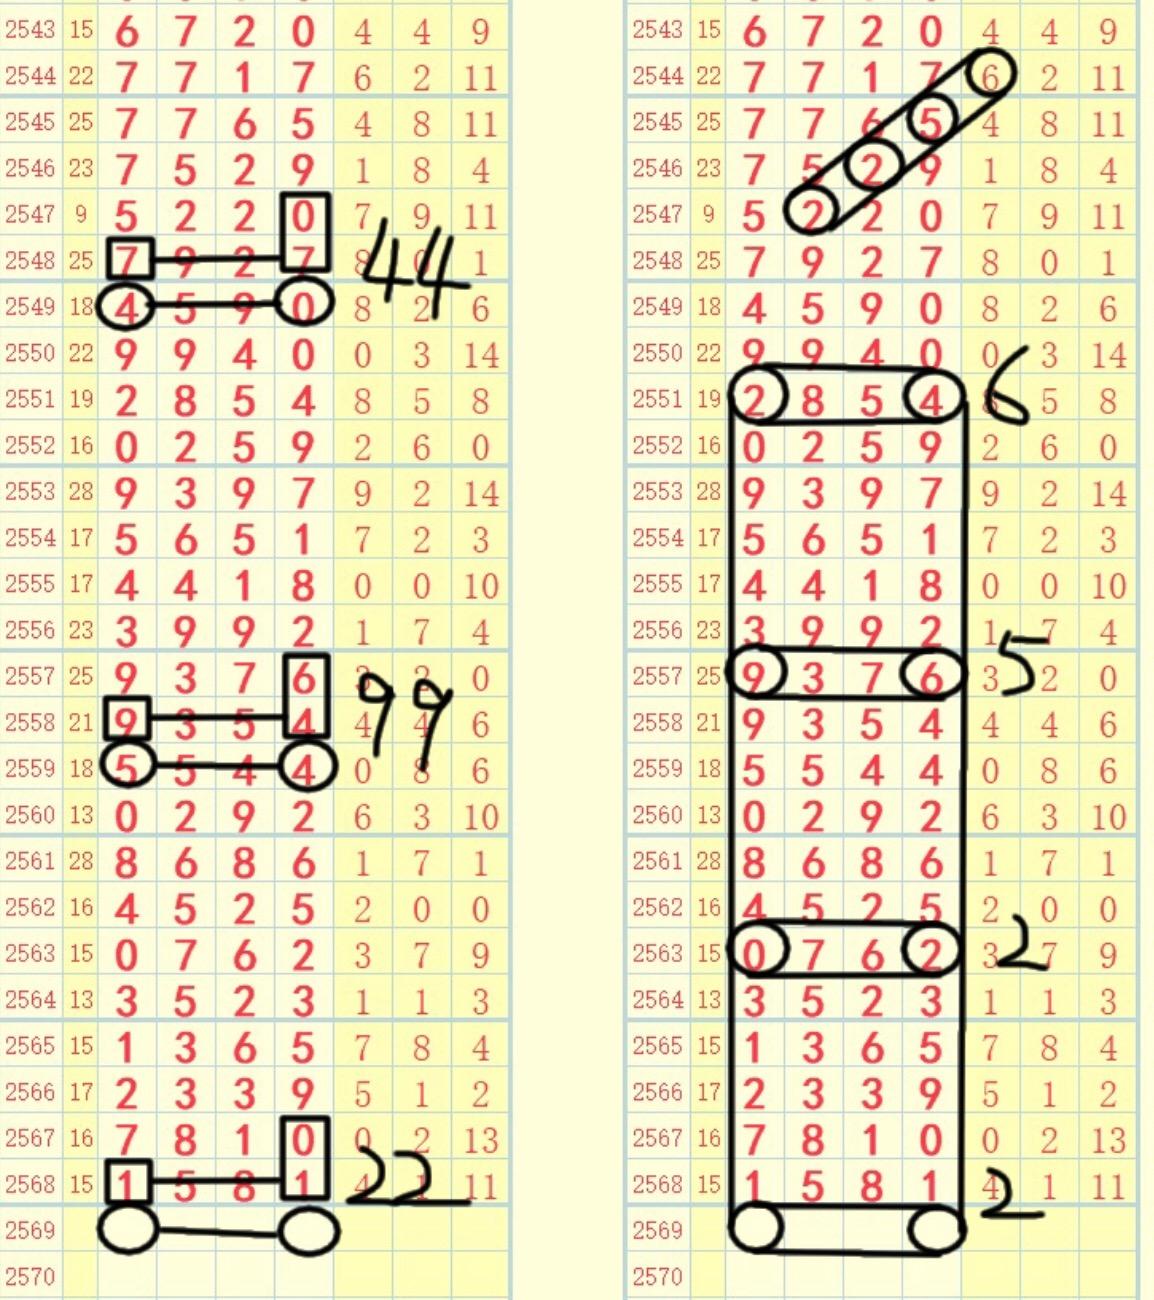 4FCFED0F-3079-4F66-9558-B9C5064AAEE8.jpeg